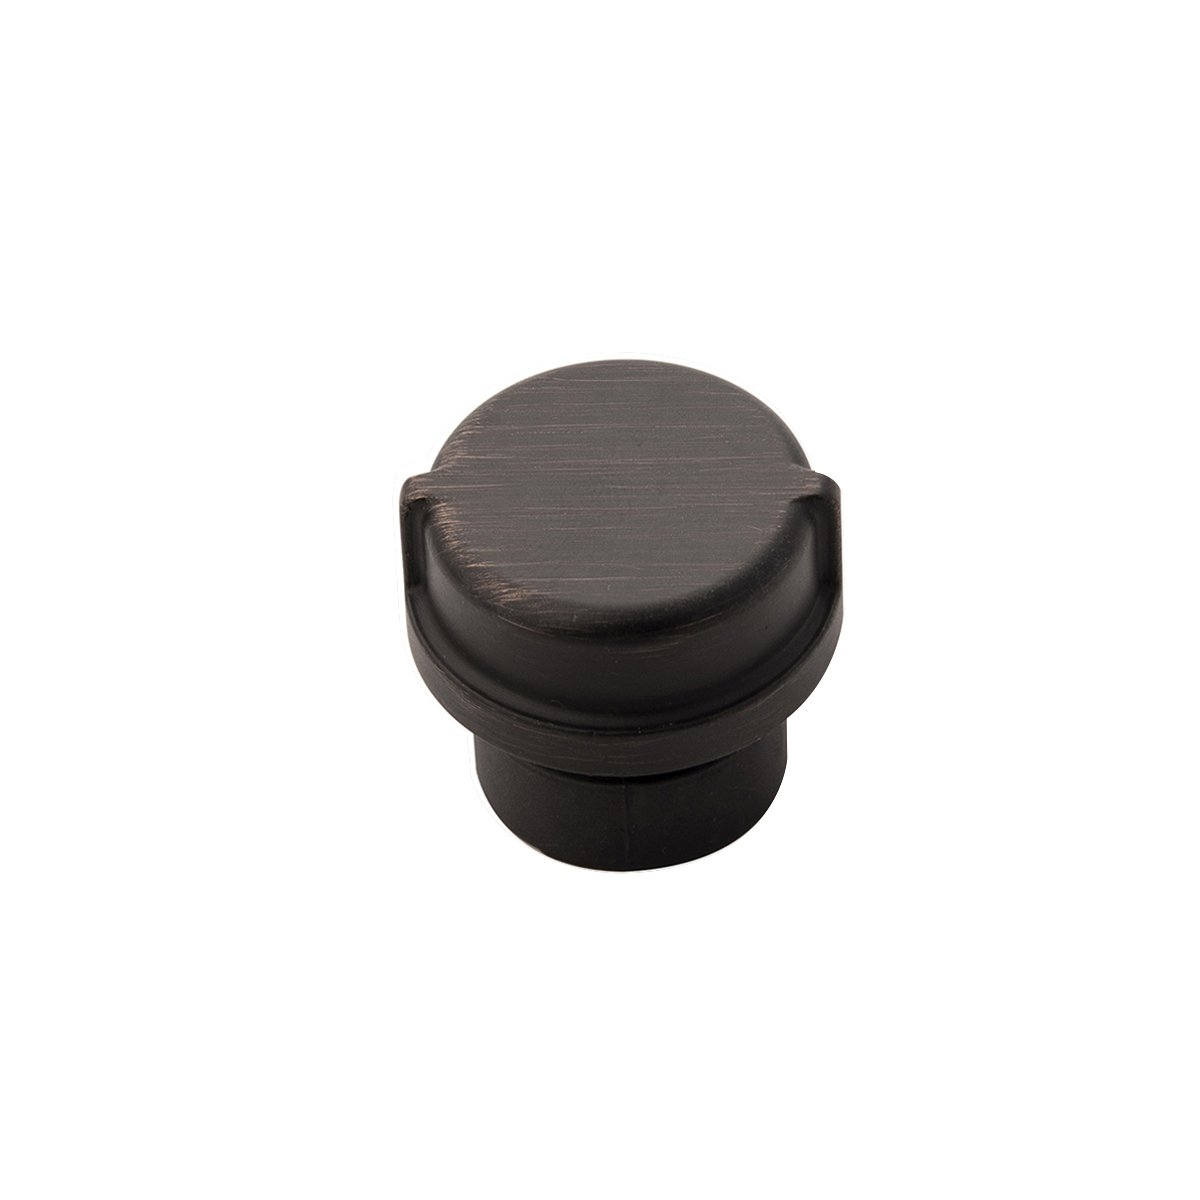 Hickory Hardware HH075028-VB Pipeline Collection Knob 1-1/4 Inch Diameter Vintage Bronze